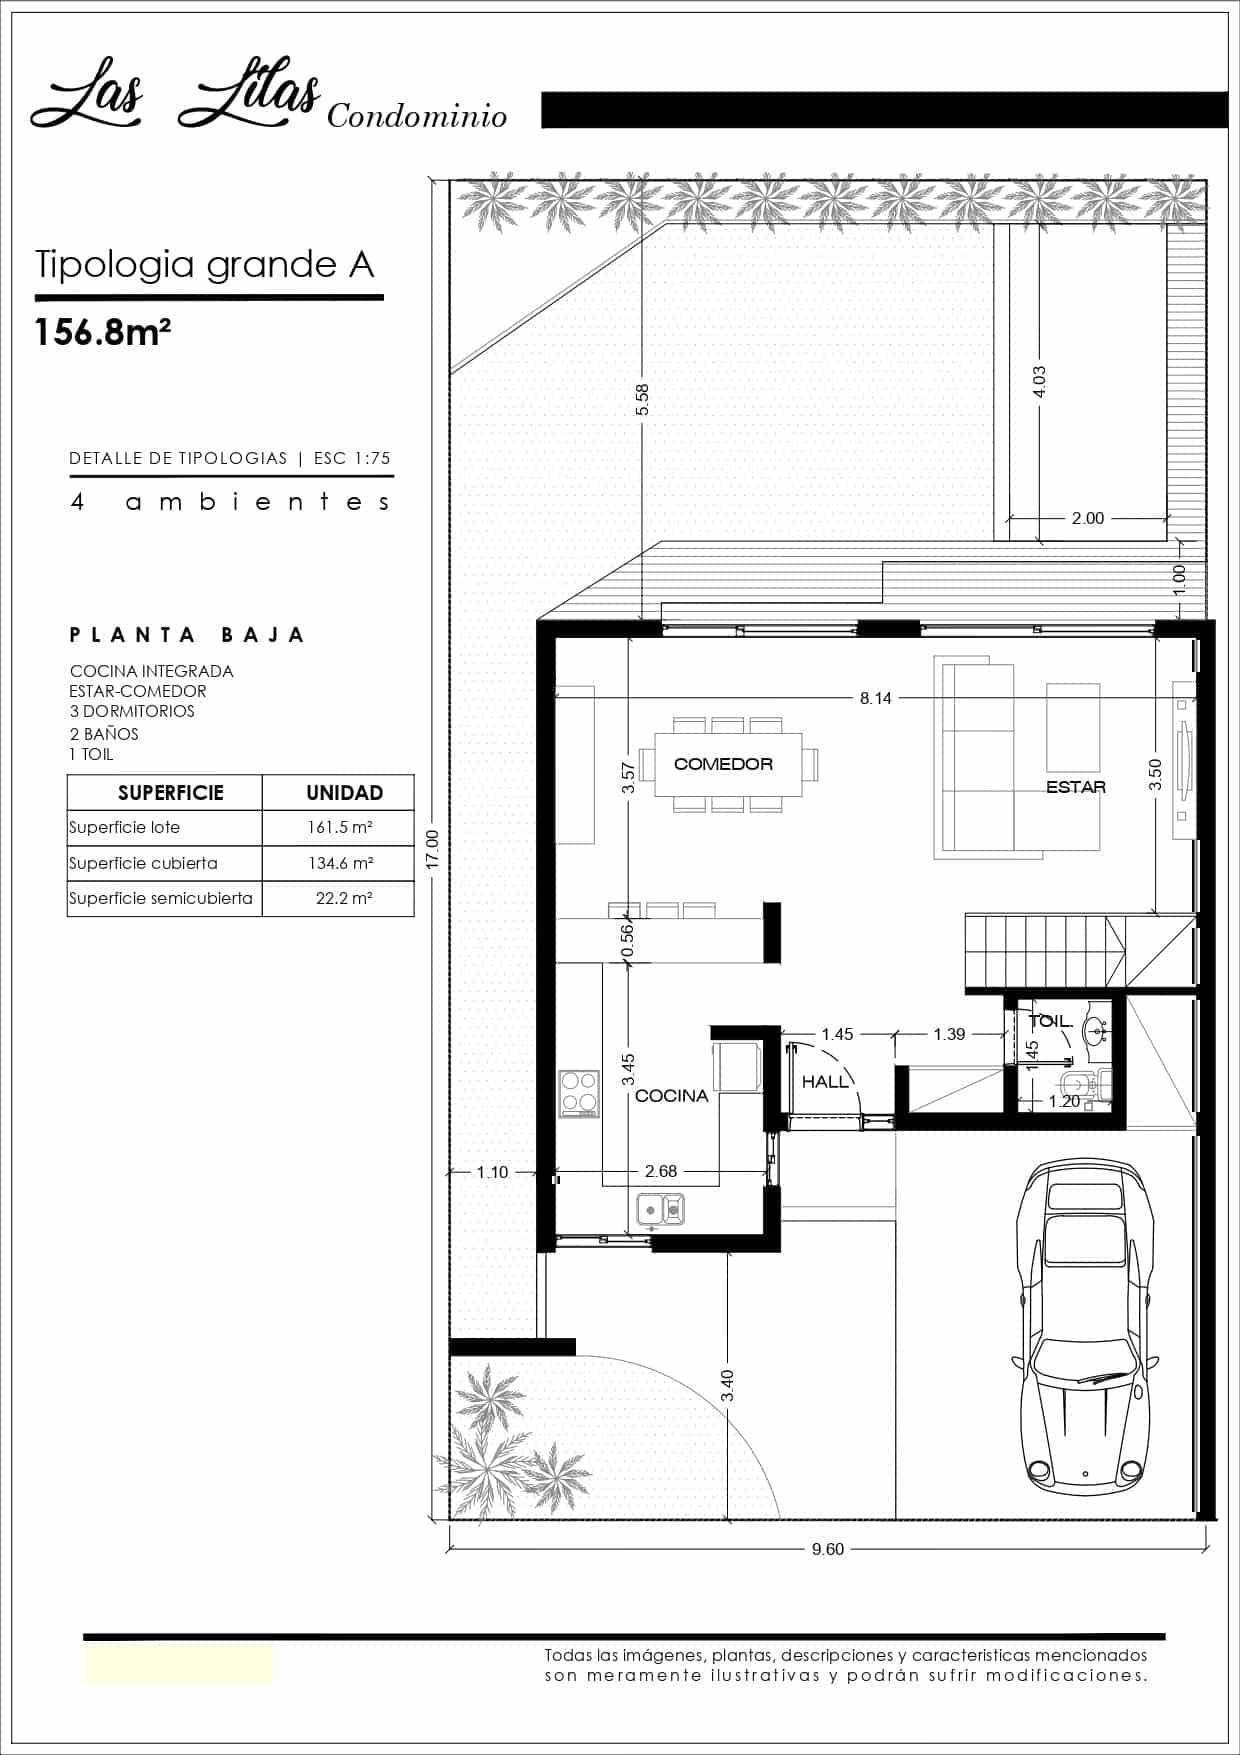 Las lillas condominio- Tipologia Grande - PB_page-0001.jpg